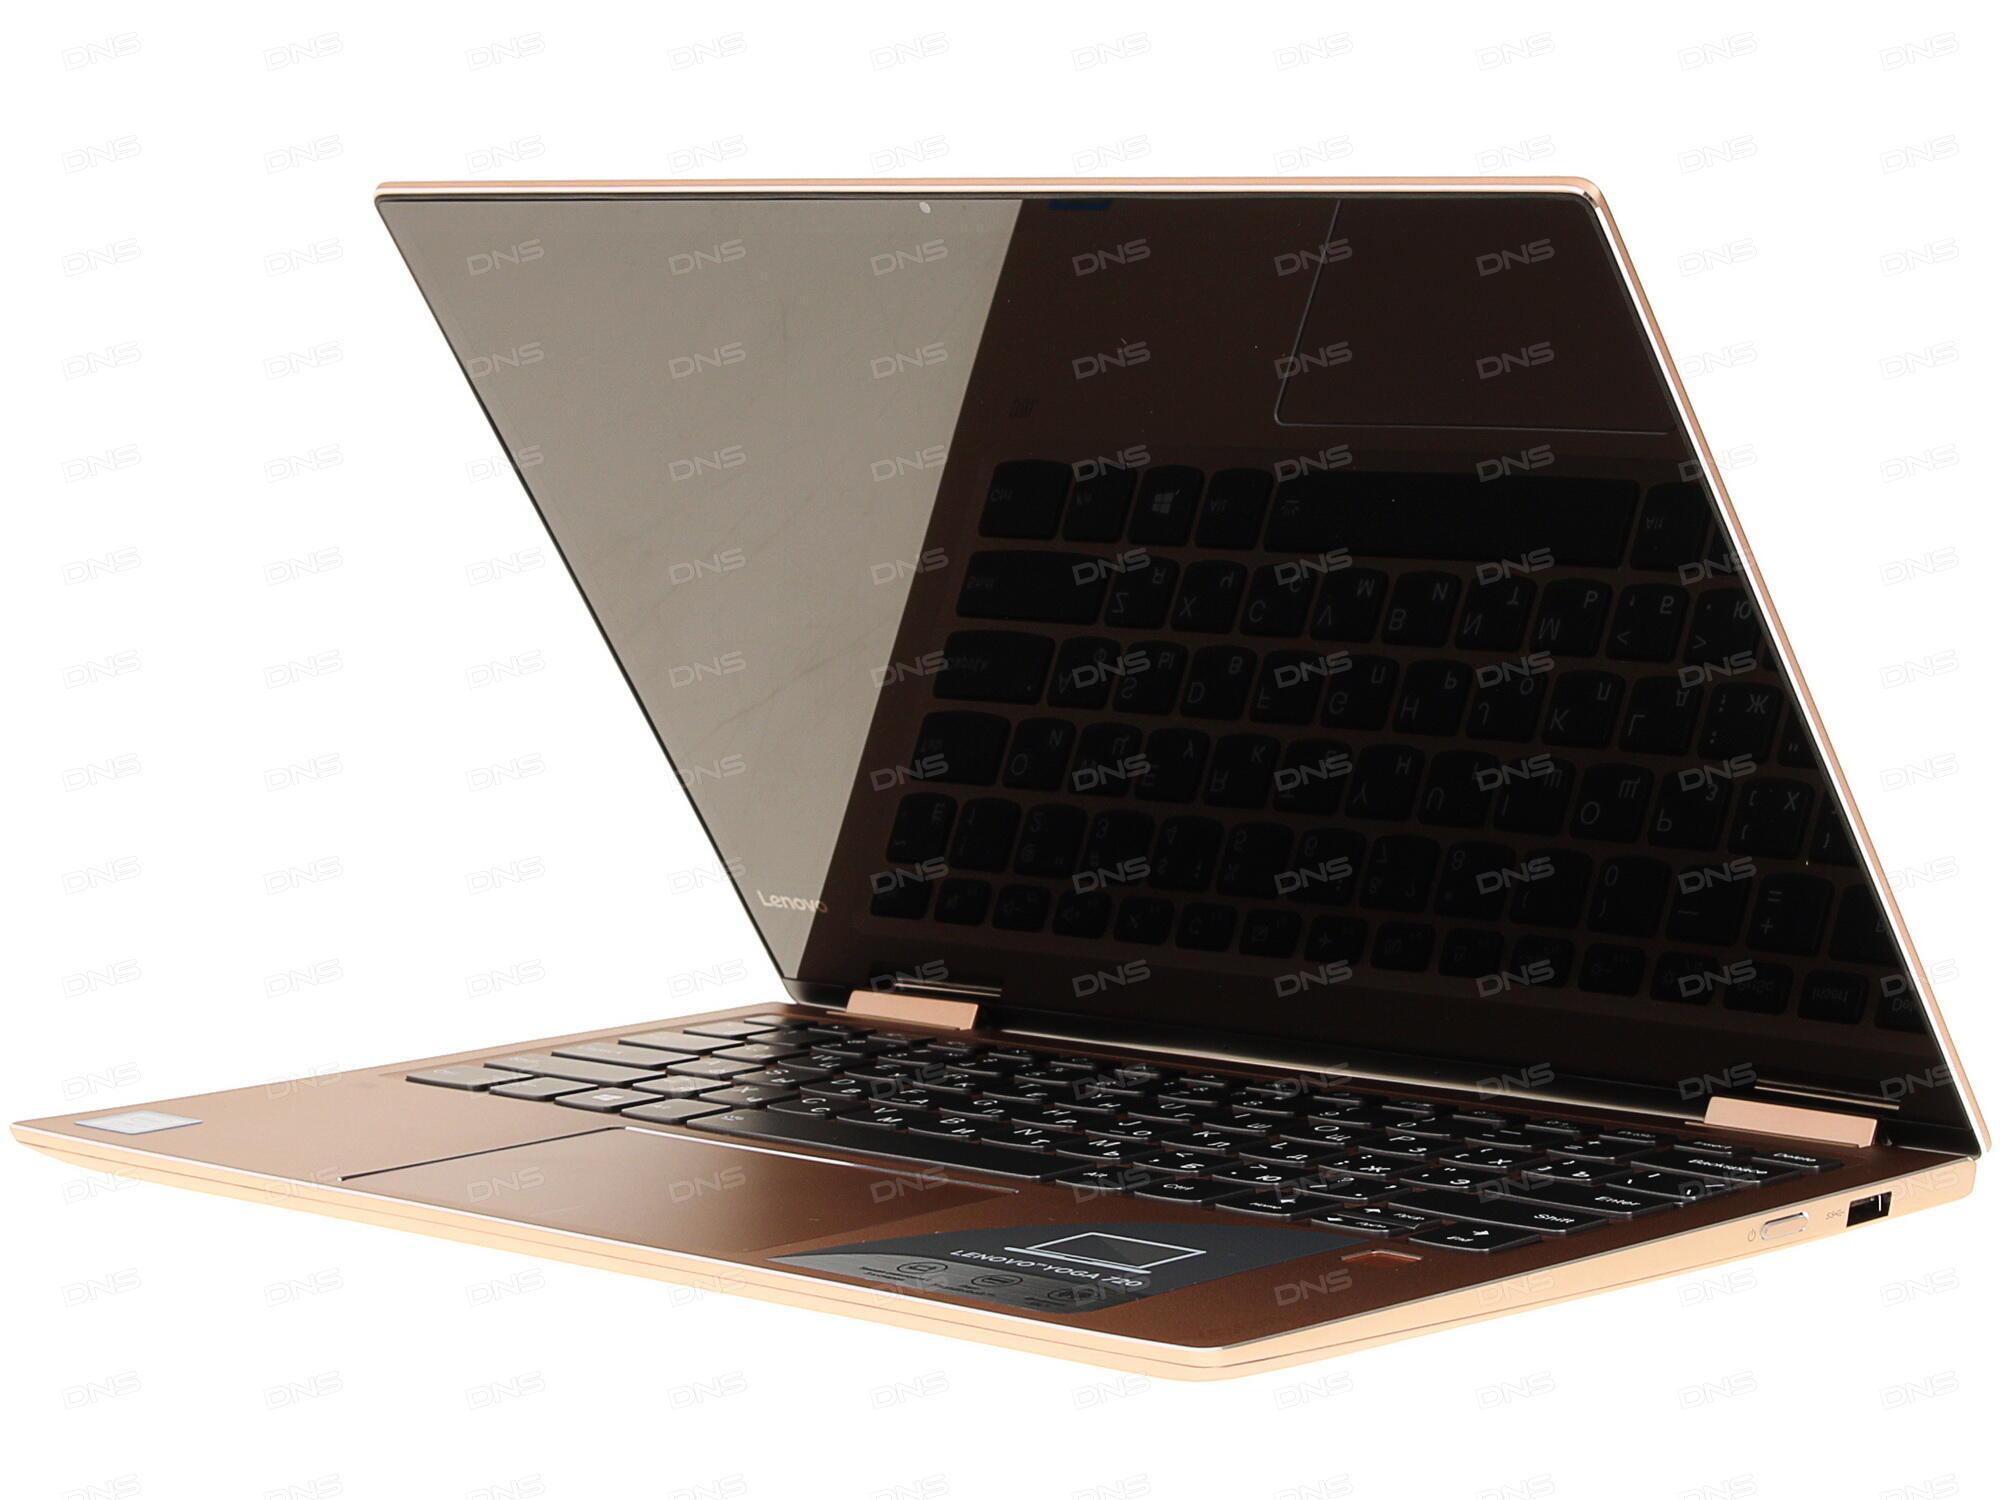 Ноутбук Lenovo 720-13IKB 80X6005ARK (Intel Core i5-7200U 2.5 GHz/8192Mb/256Gb/No ODD/Intel HD Graphics/Wi-Fi/Bluetooth/Cam/13.3/1920x1080/Touchscreen/Windows 10 64-bit)